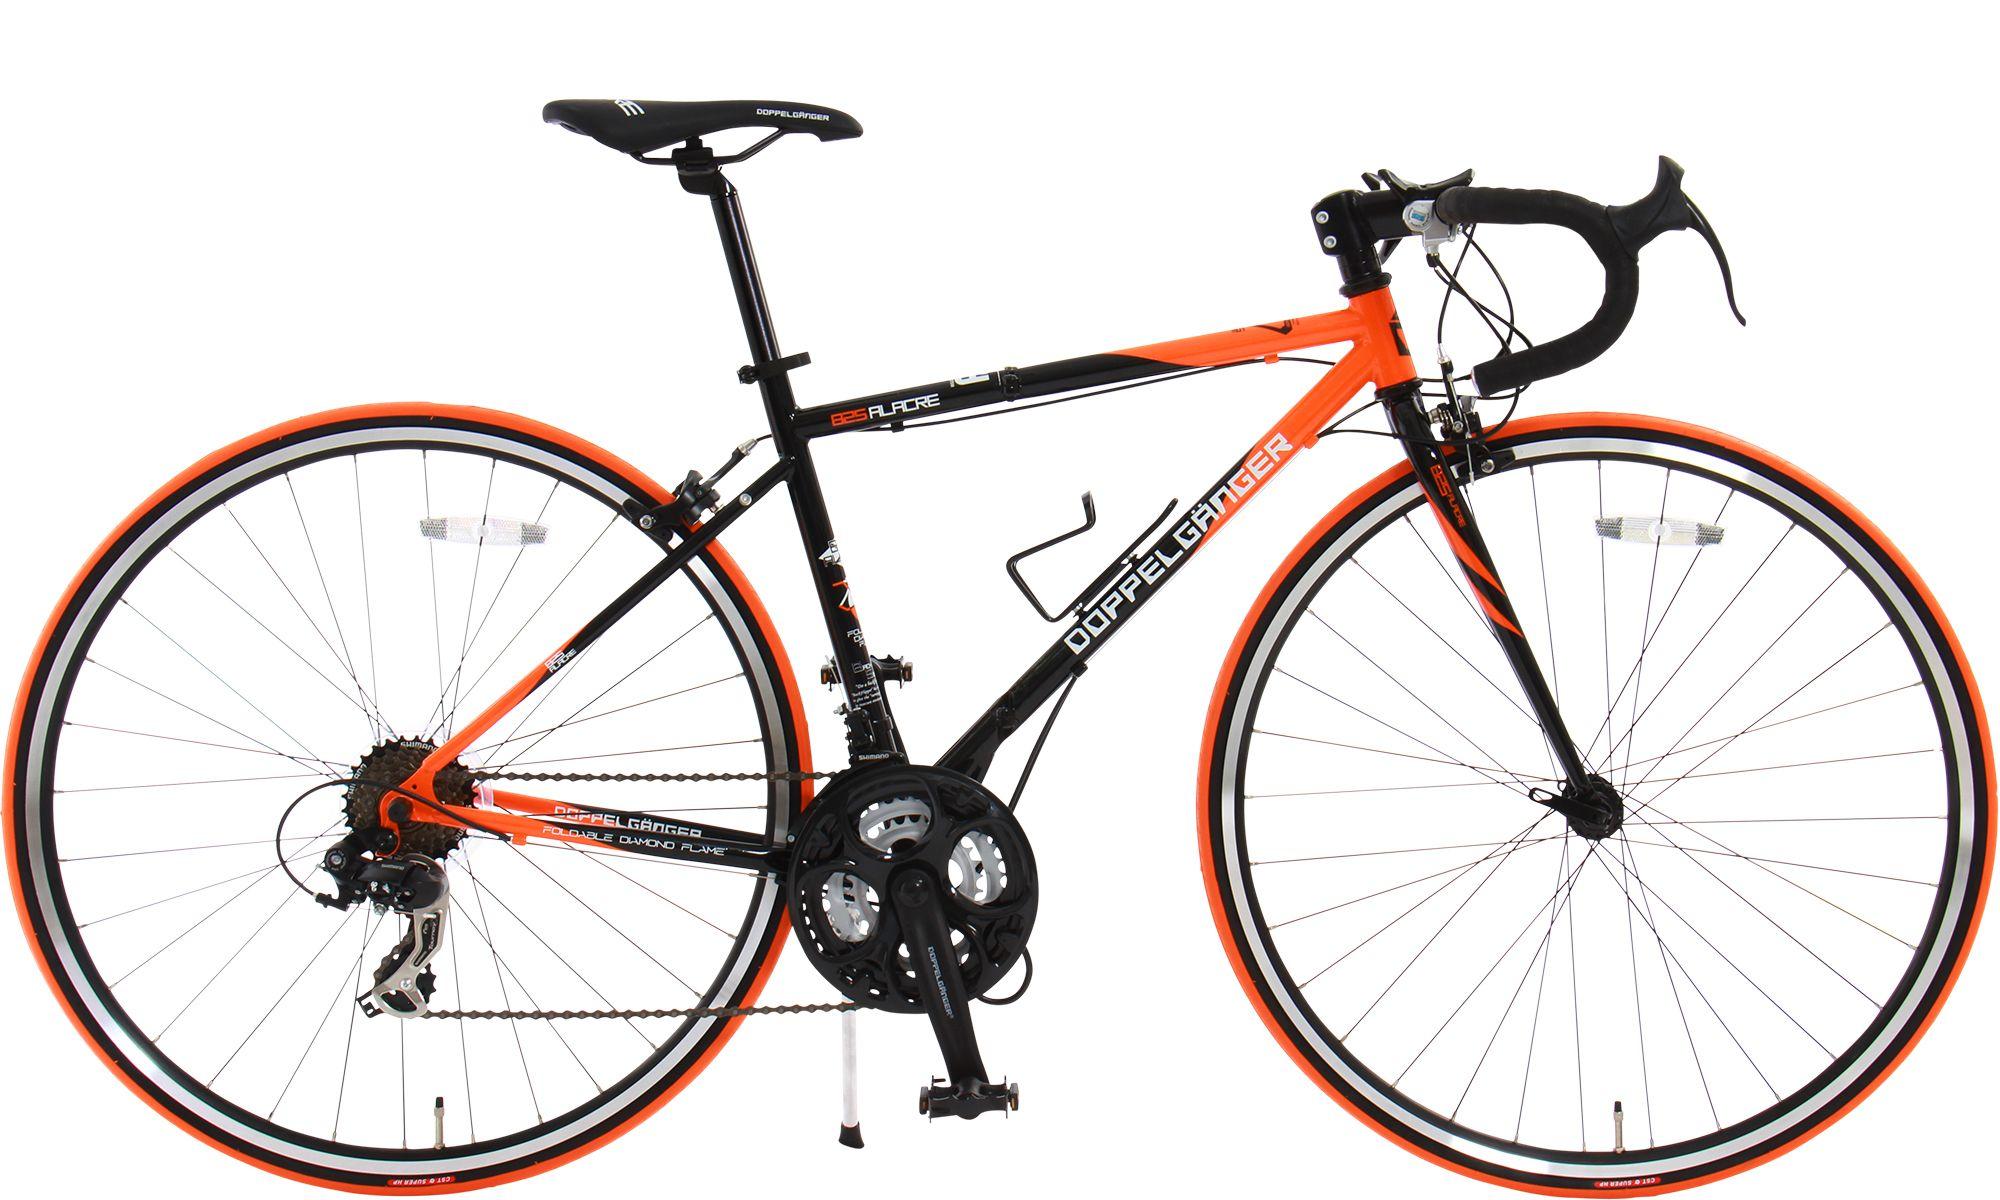 DOPPELGANGER®[ドッペルギャンガー]自転車ブランド Product page 825 - ALACRE